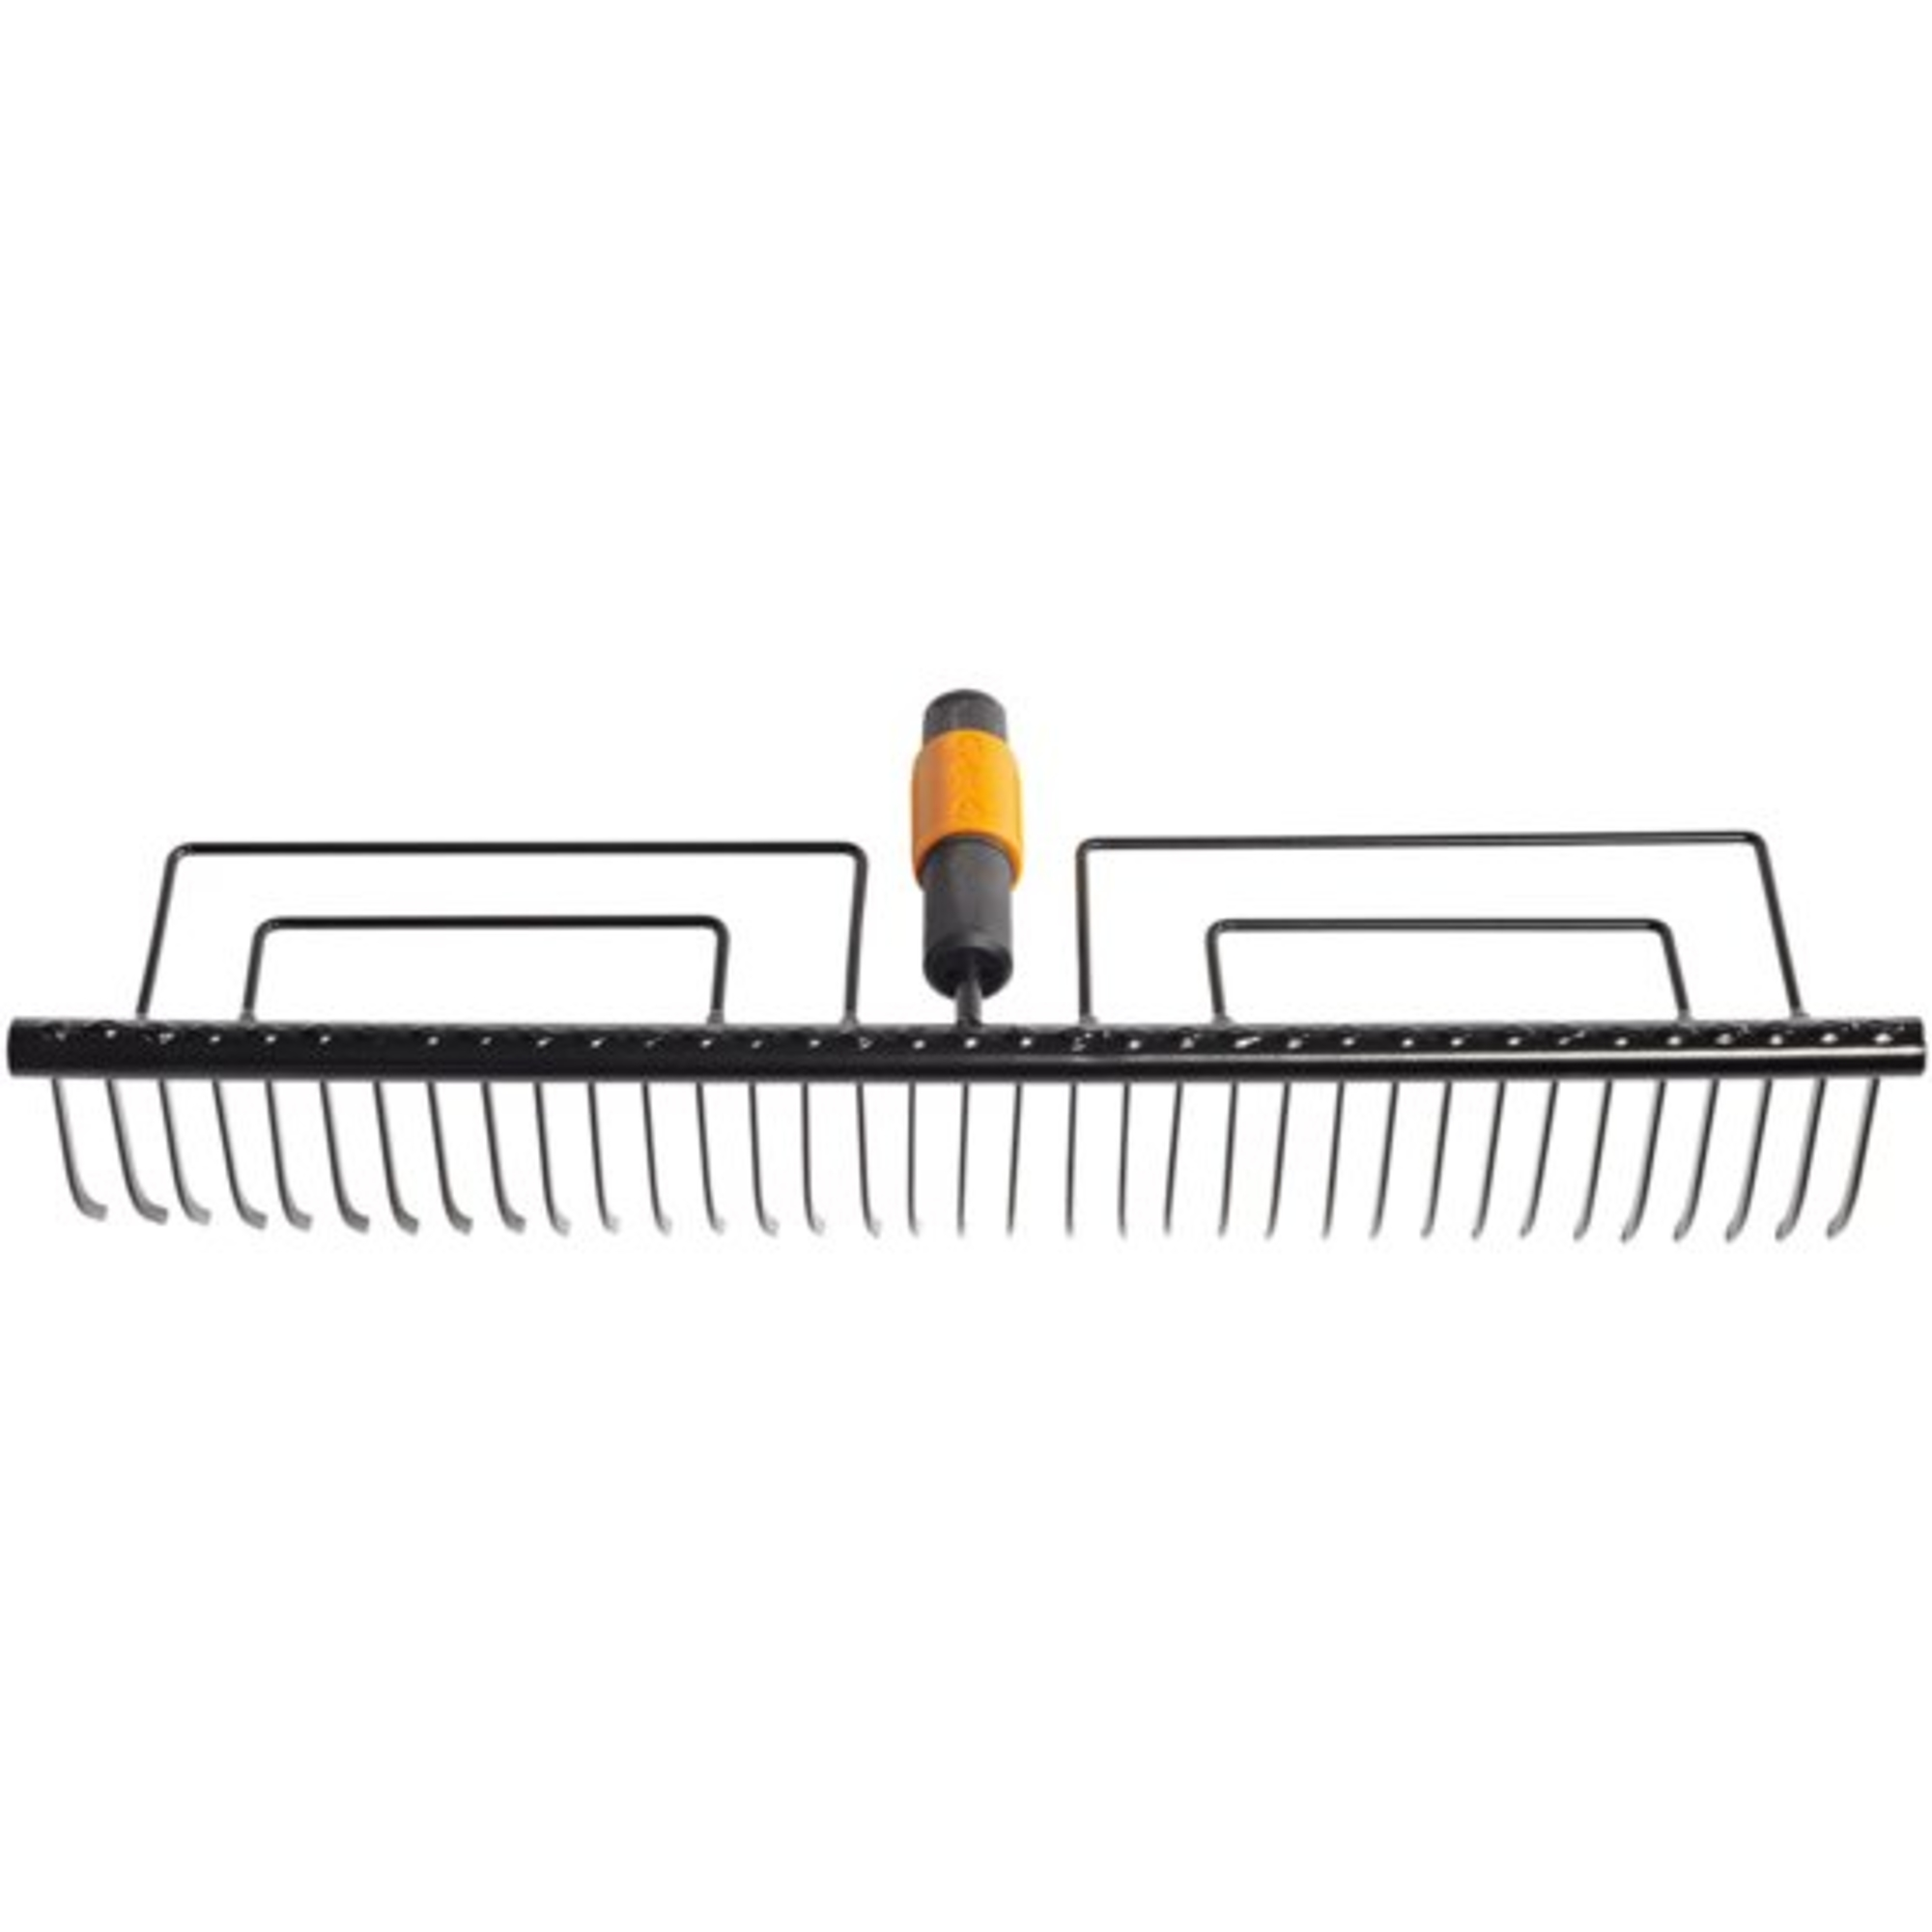 Fiskars QuikFit™ gyűjtőgereblye fej - 1000656